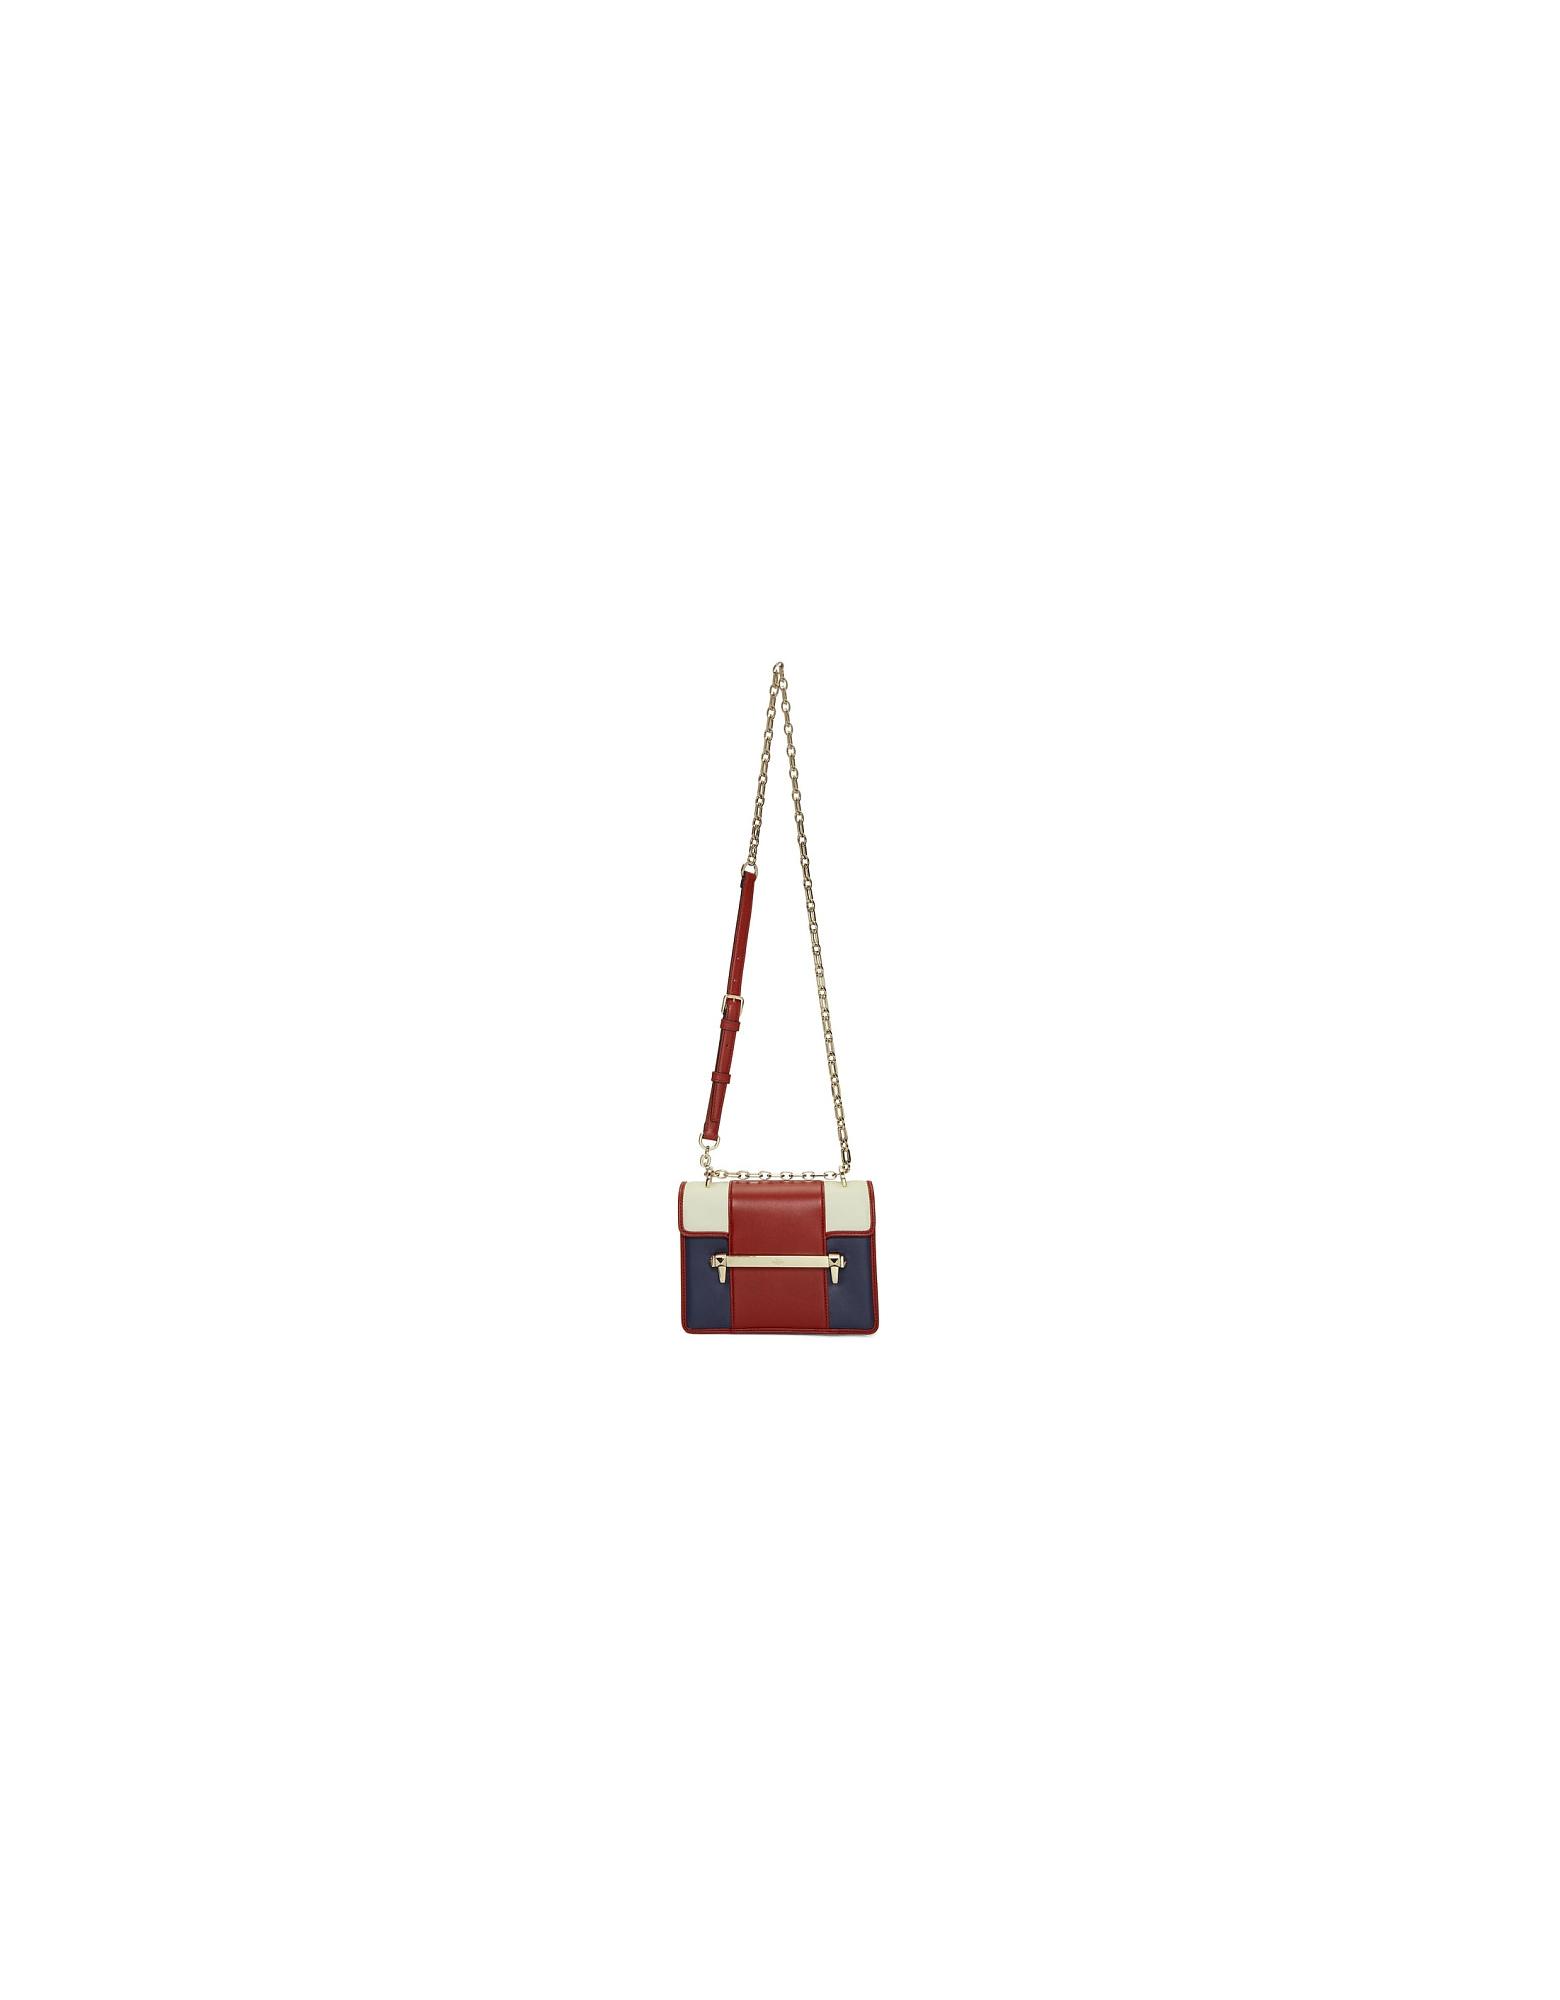 Valentino Designer Handbags, Multicolor Valentino Garavani Small Uptown Shoulder Bag